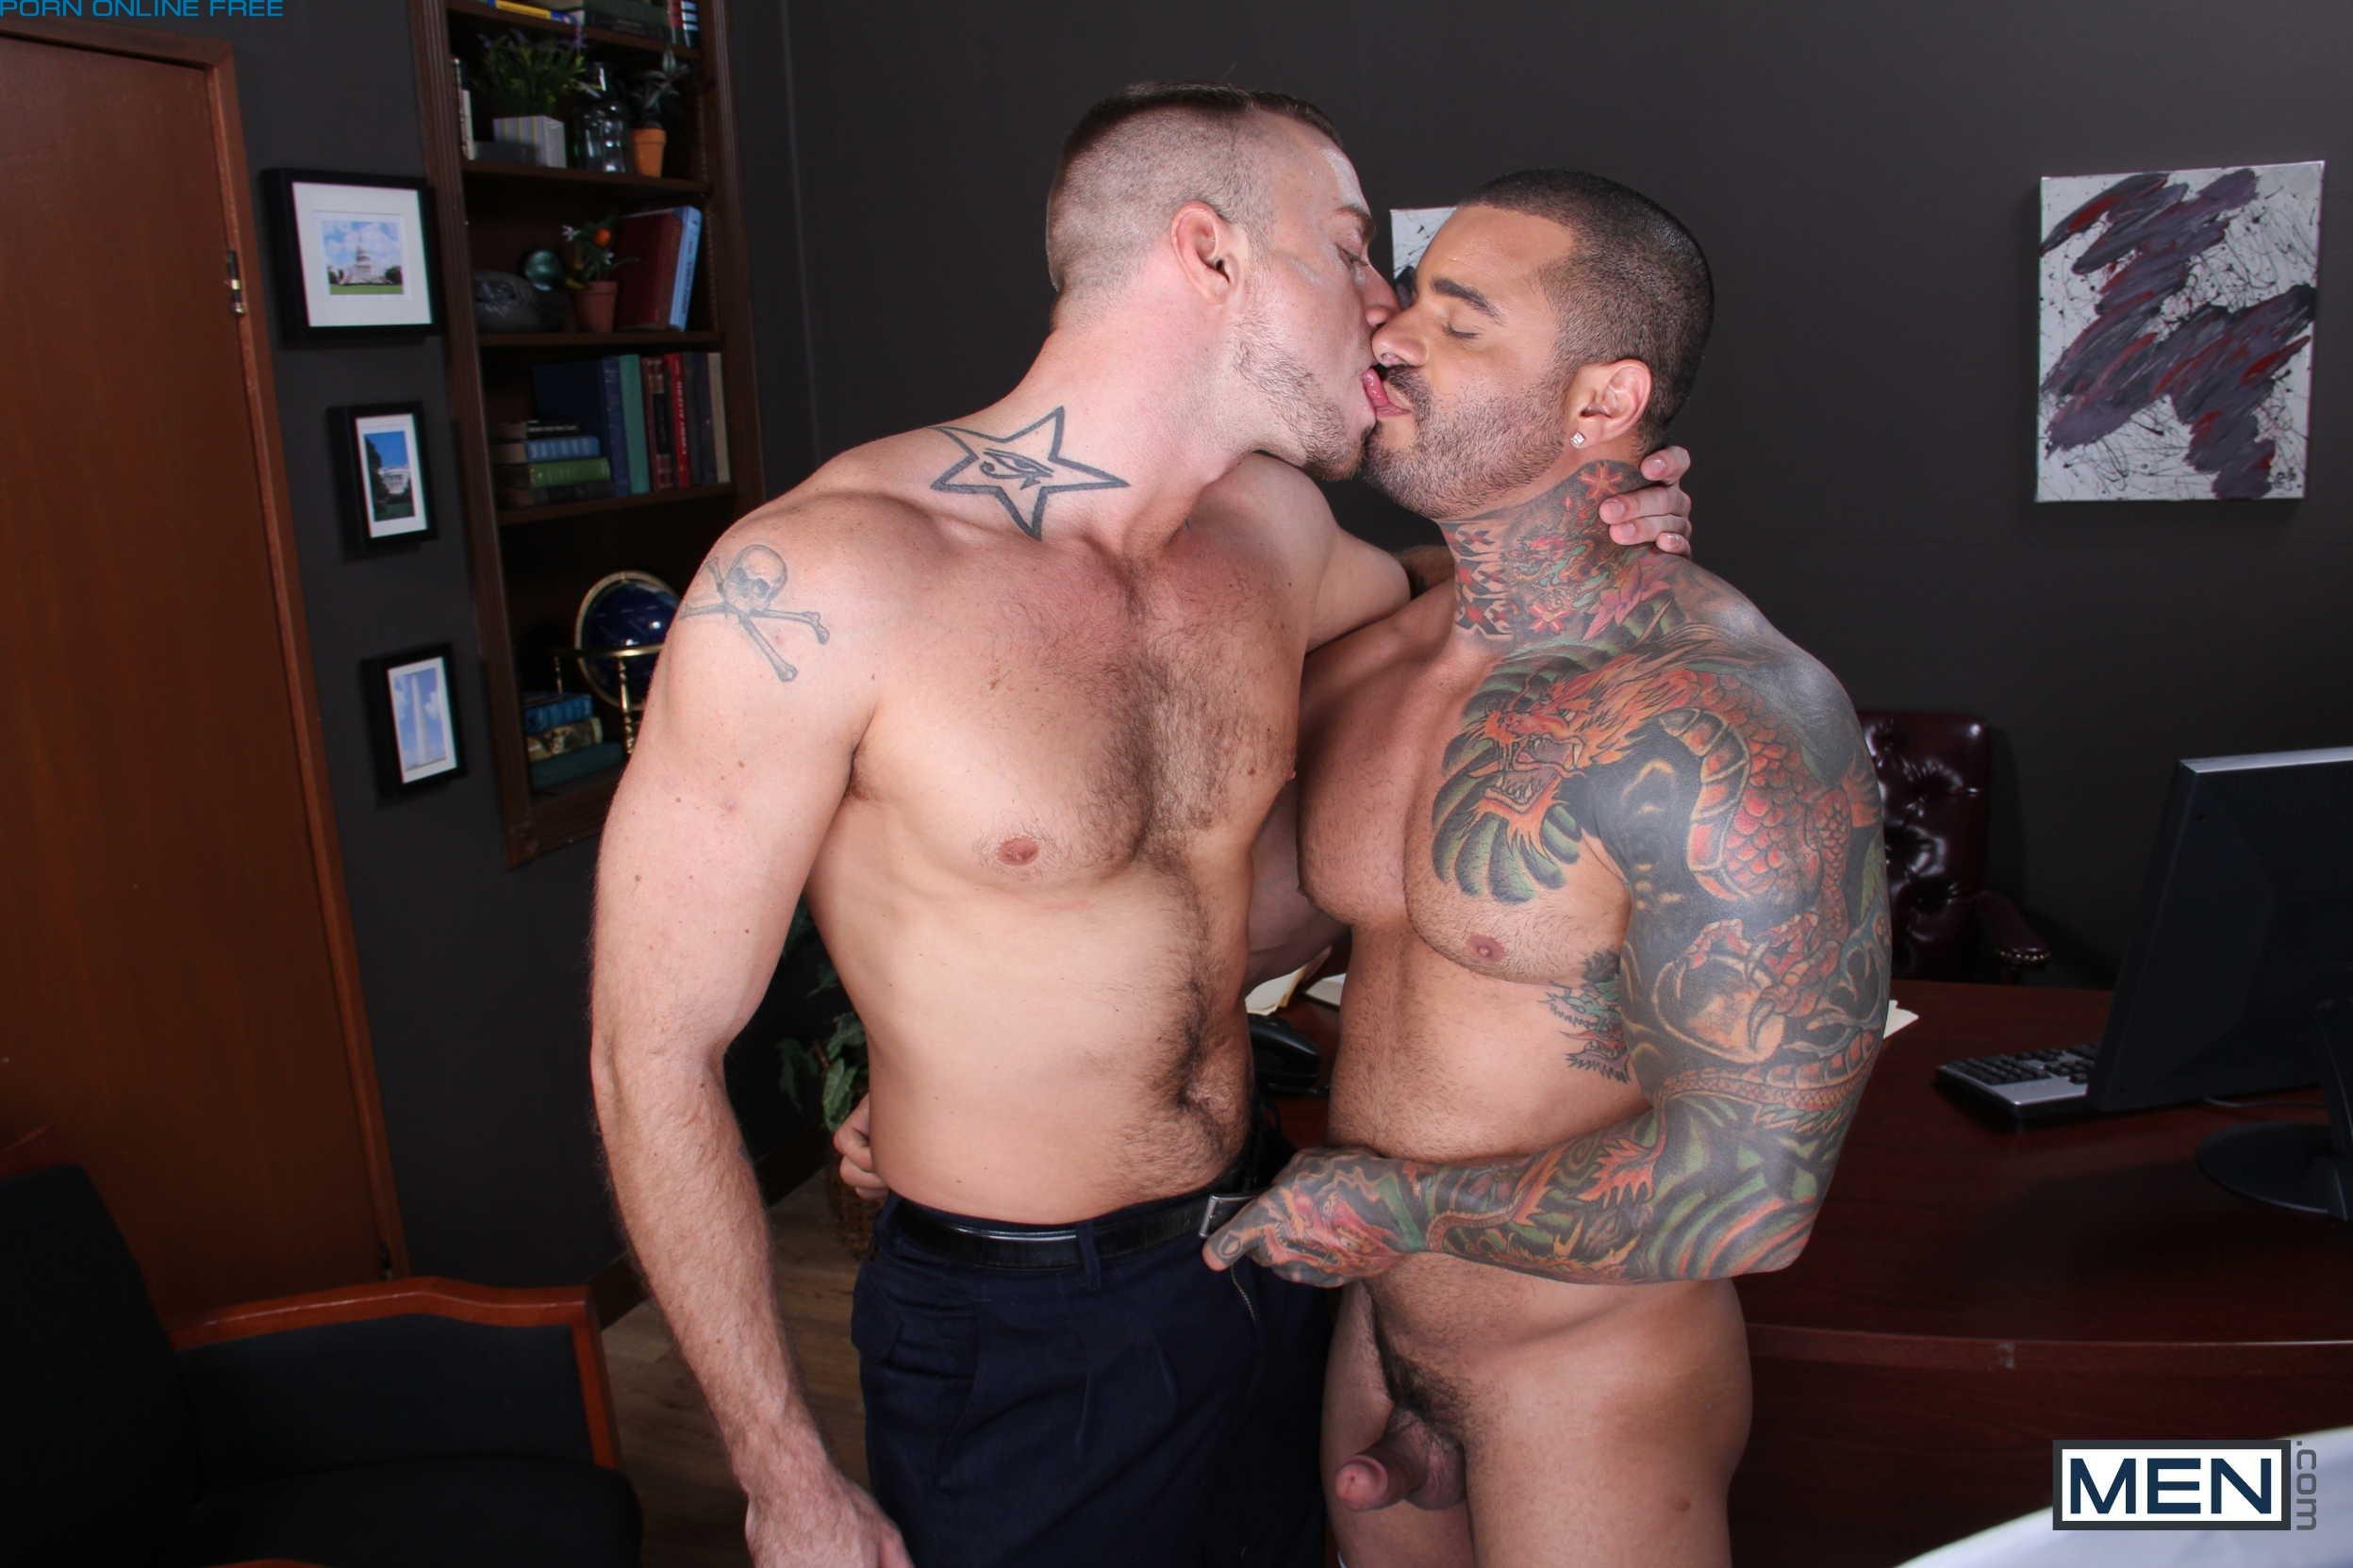 Alexsander Freitas Porn Hd jackson lawless | www.freee-porns